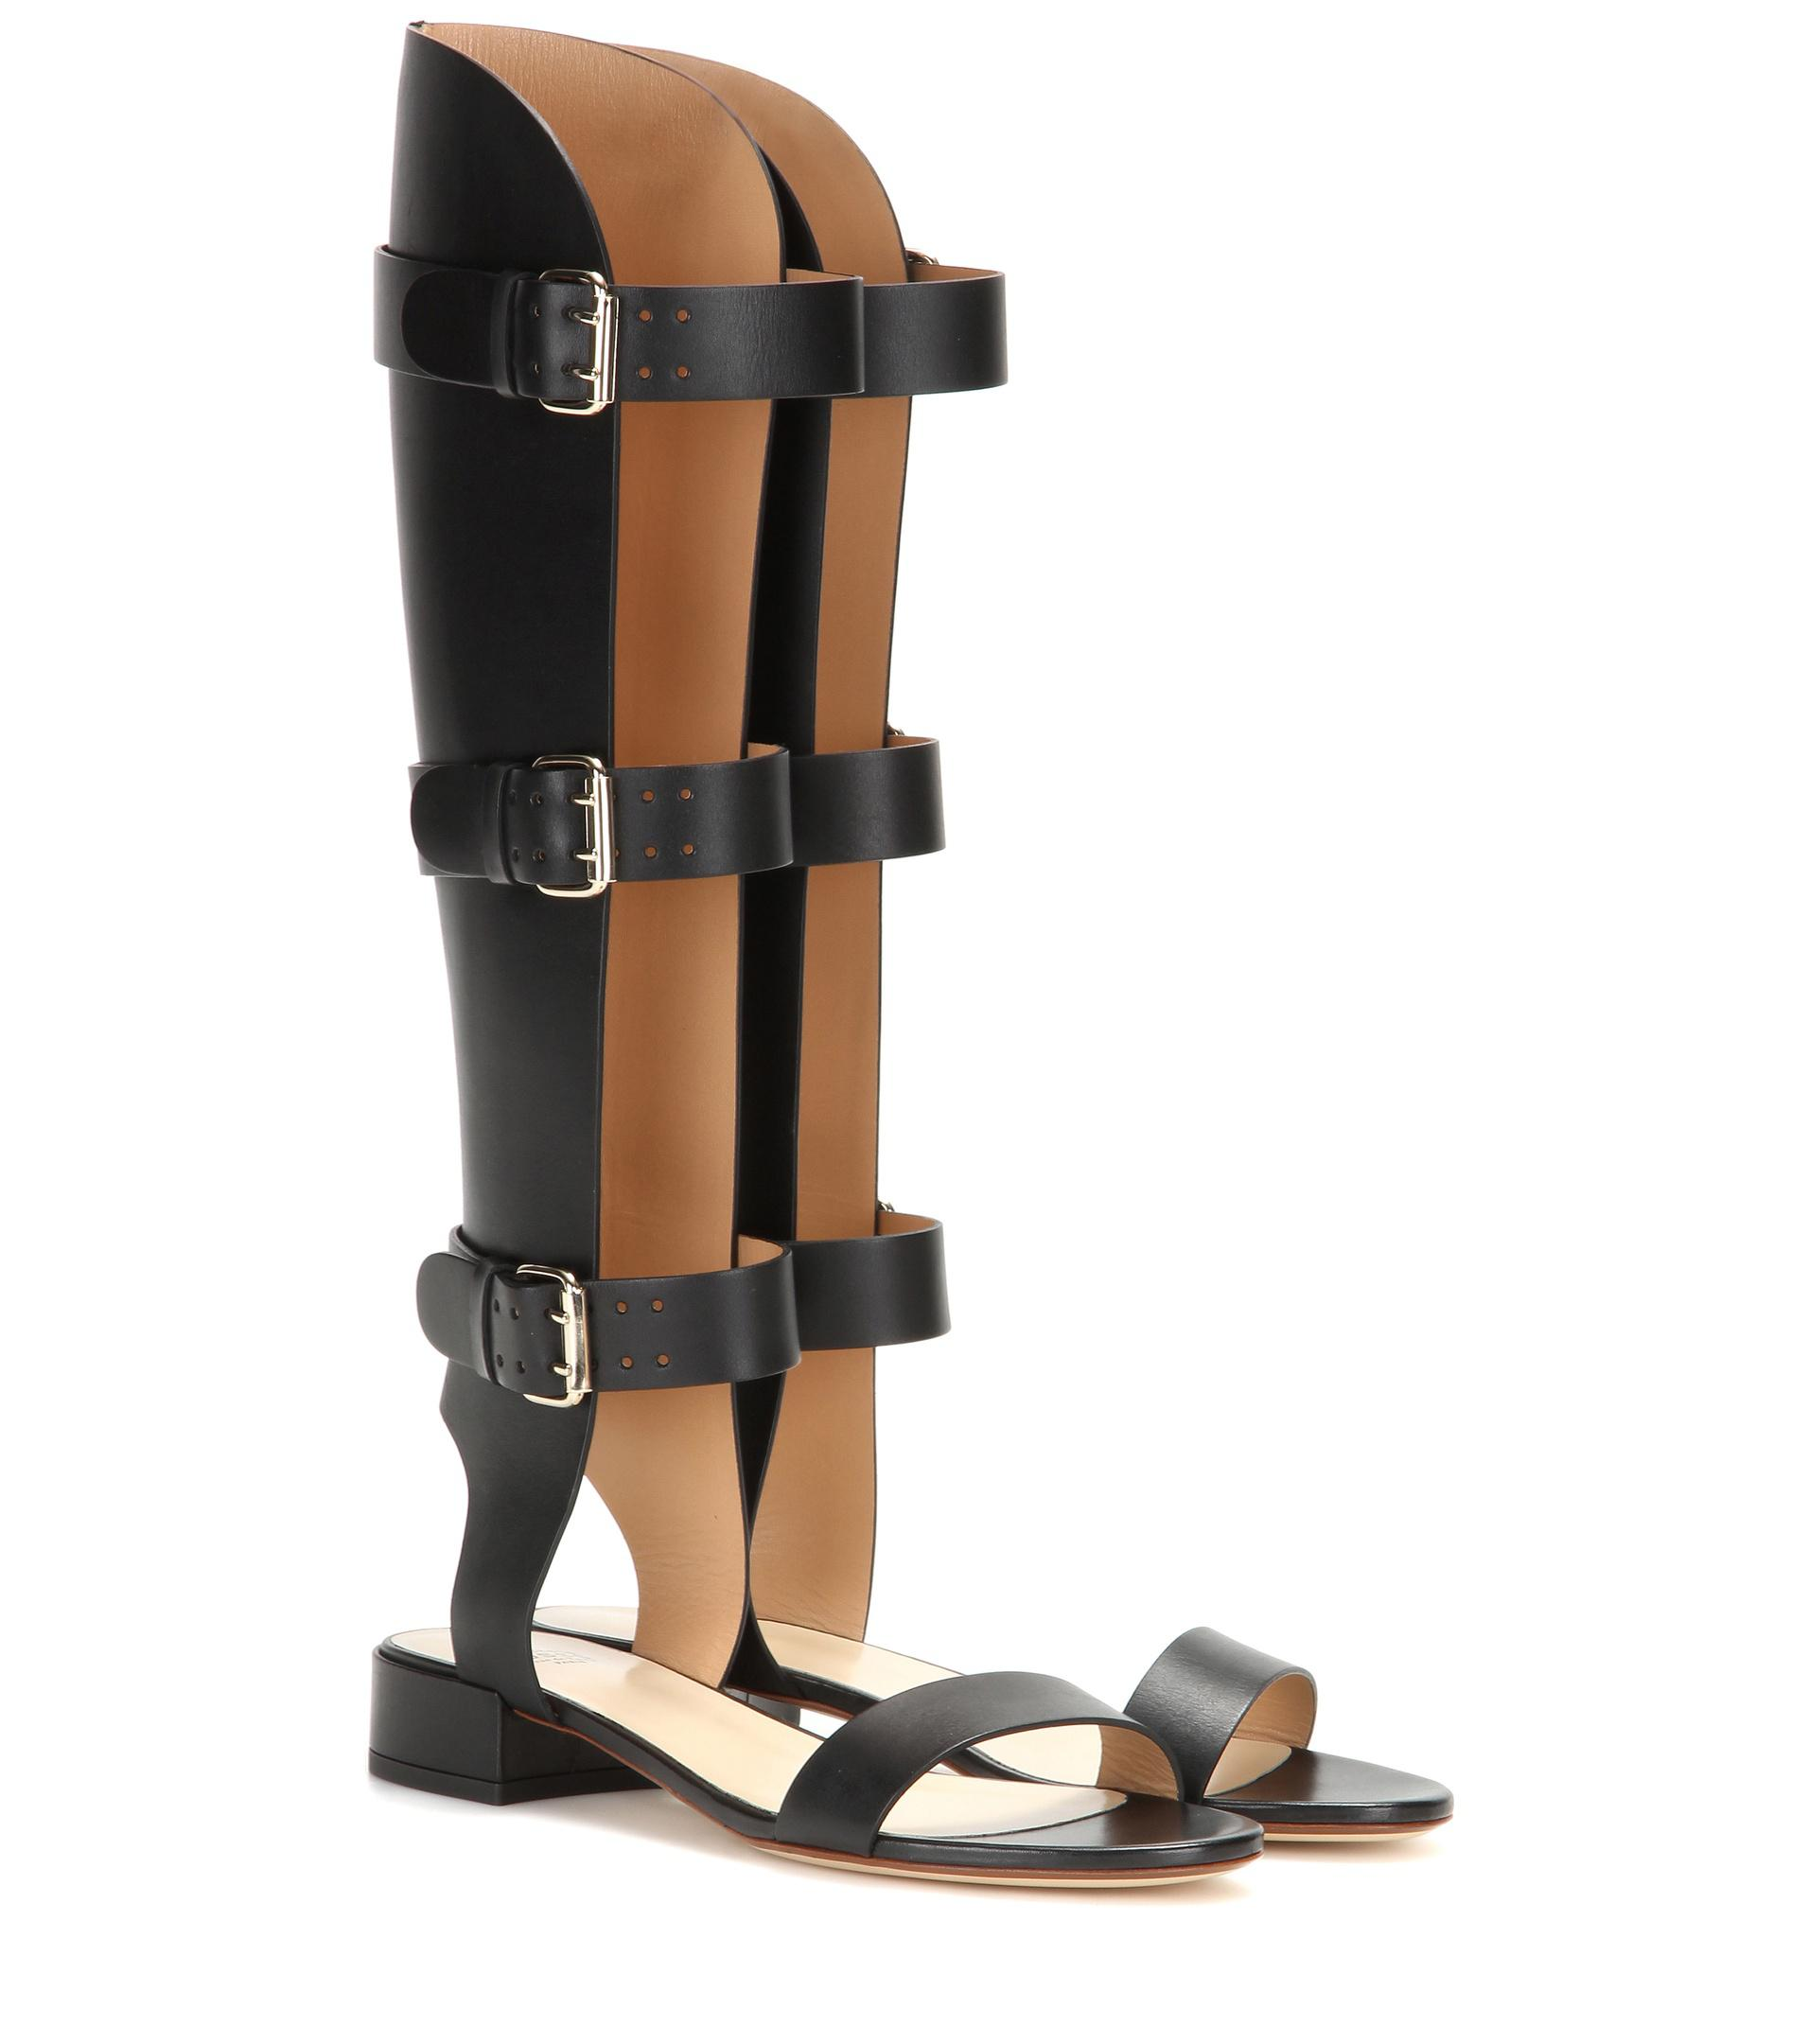 Leather gladiator sandals Francesco Russo P966uE3Ow